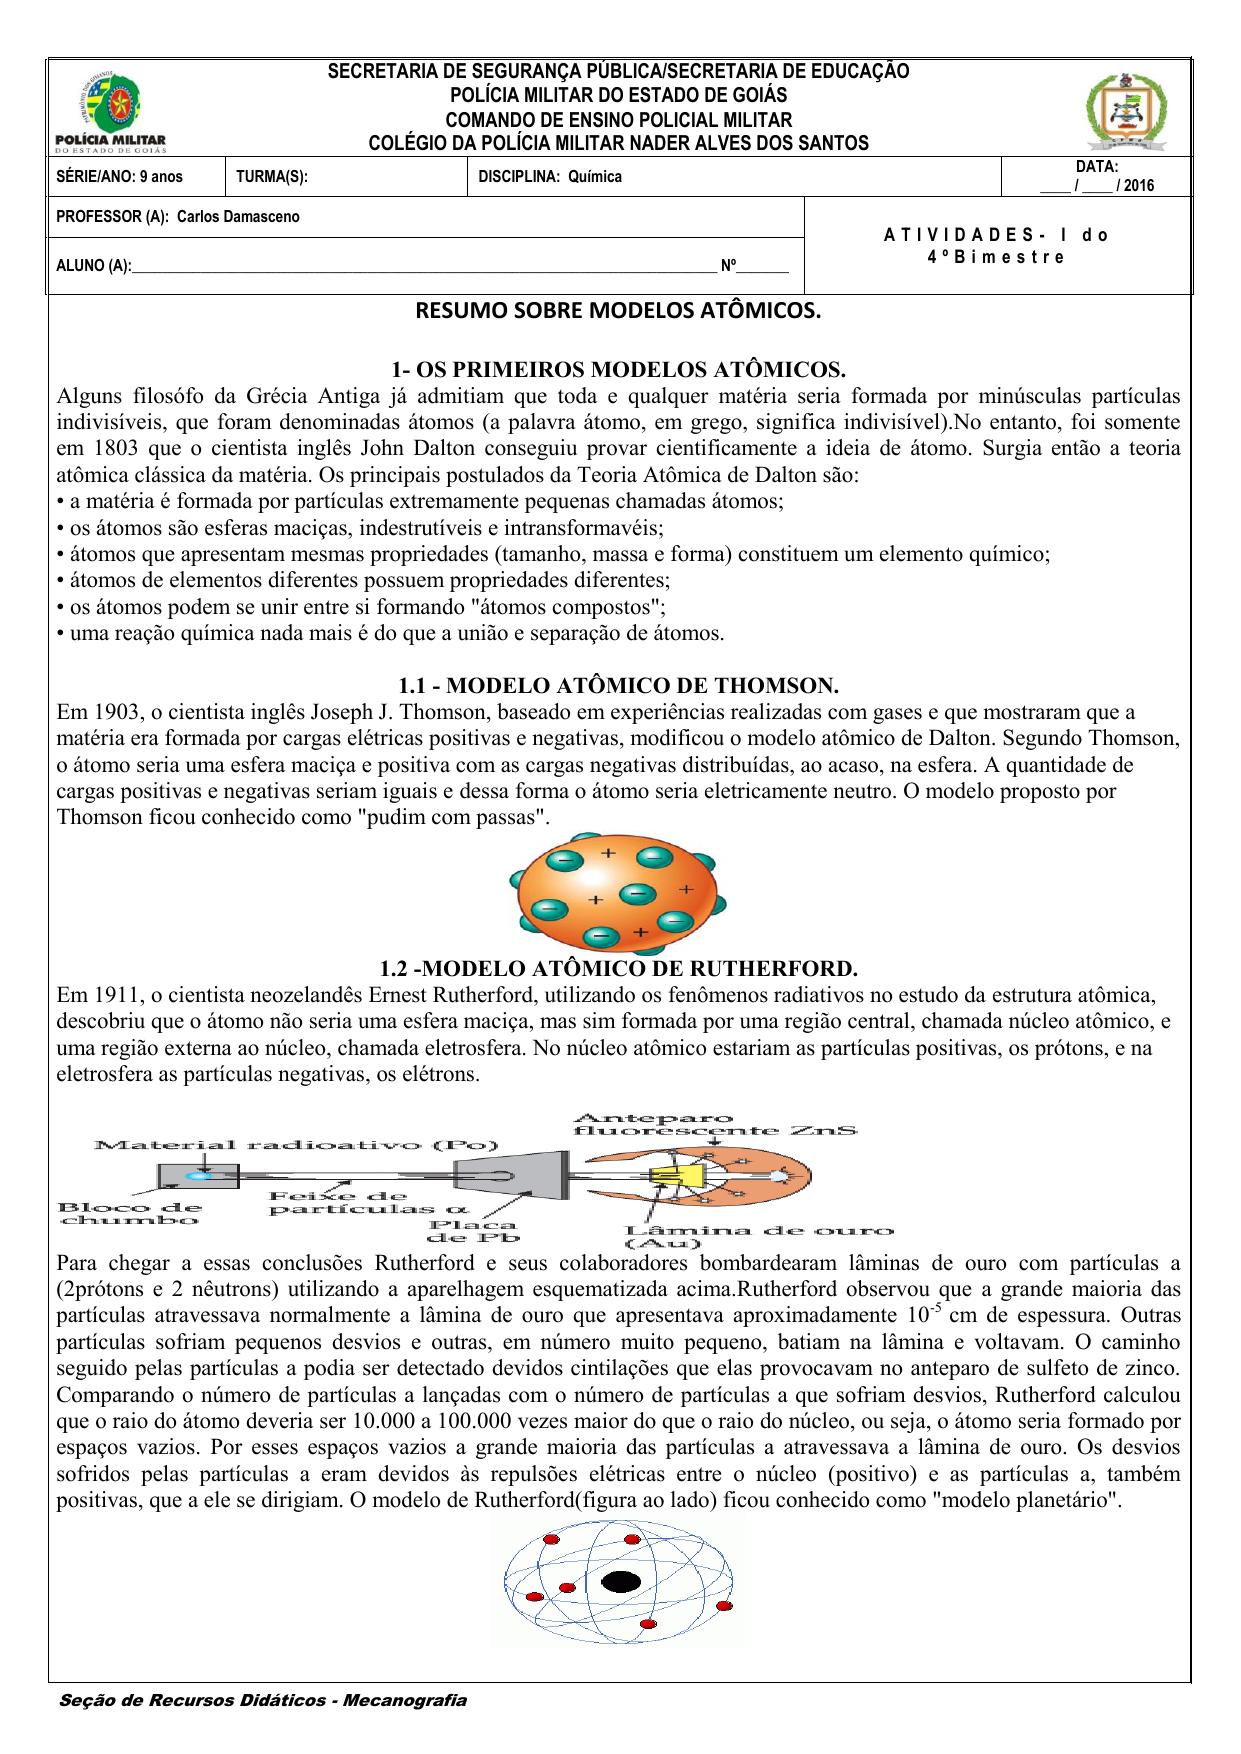 Resumo Sobre Modelos Atômicos Cpmg Sargento Nader Alves